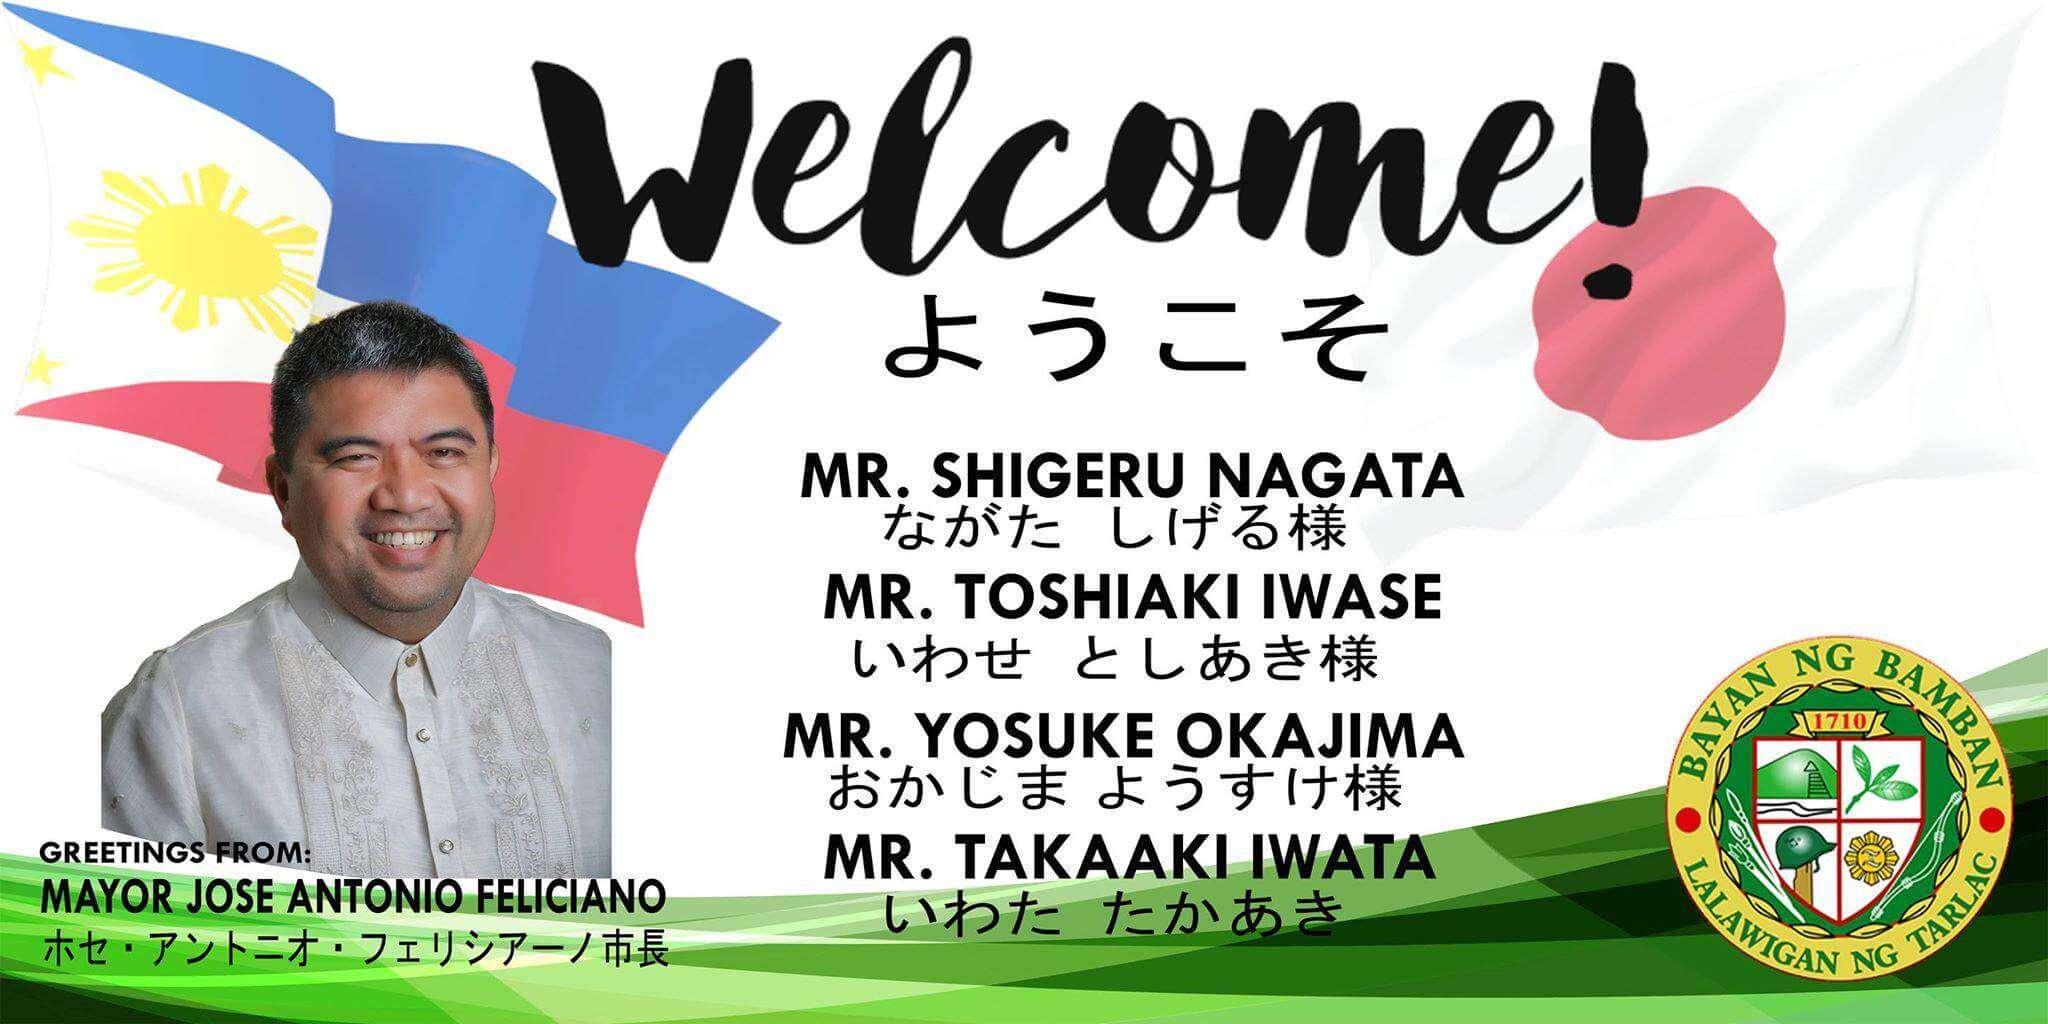 PROSPECTIVE JAPANESE INVESTORS VISITED BAMBAN